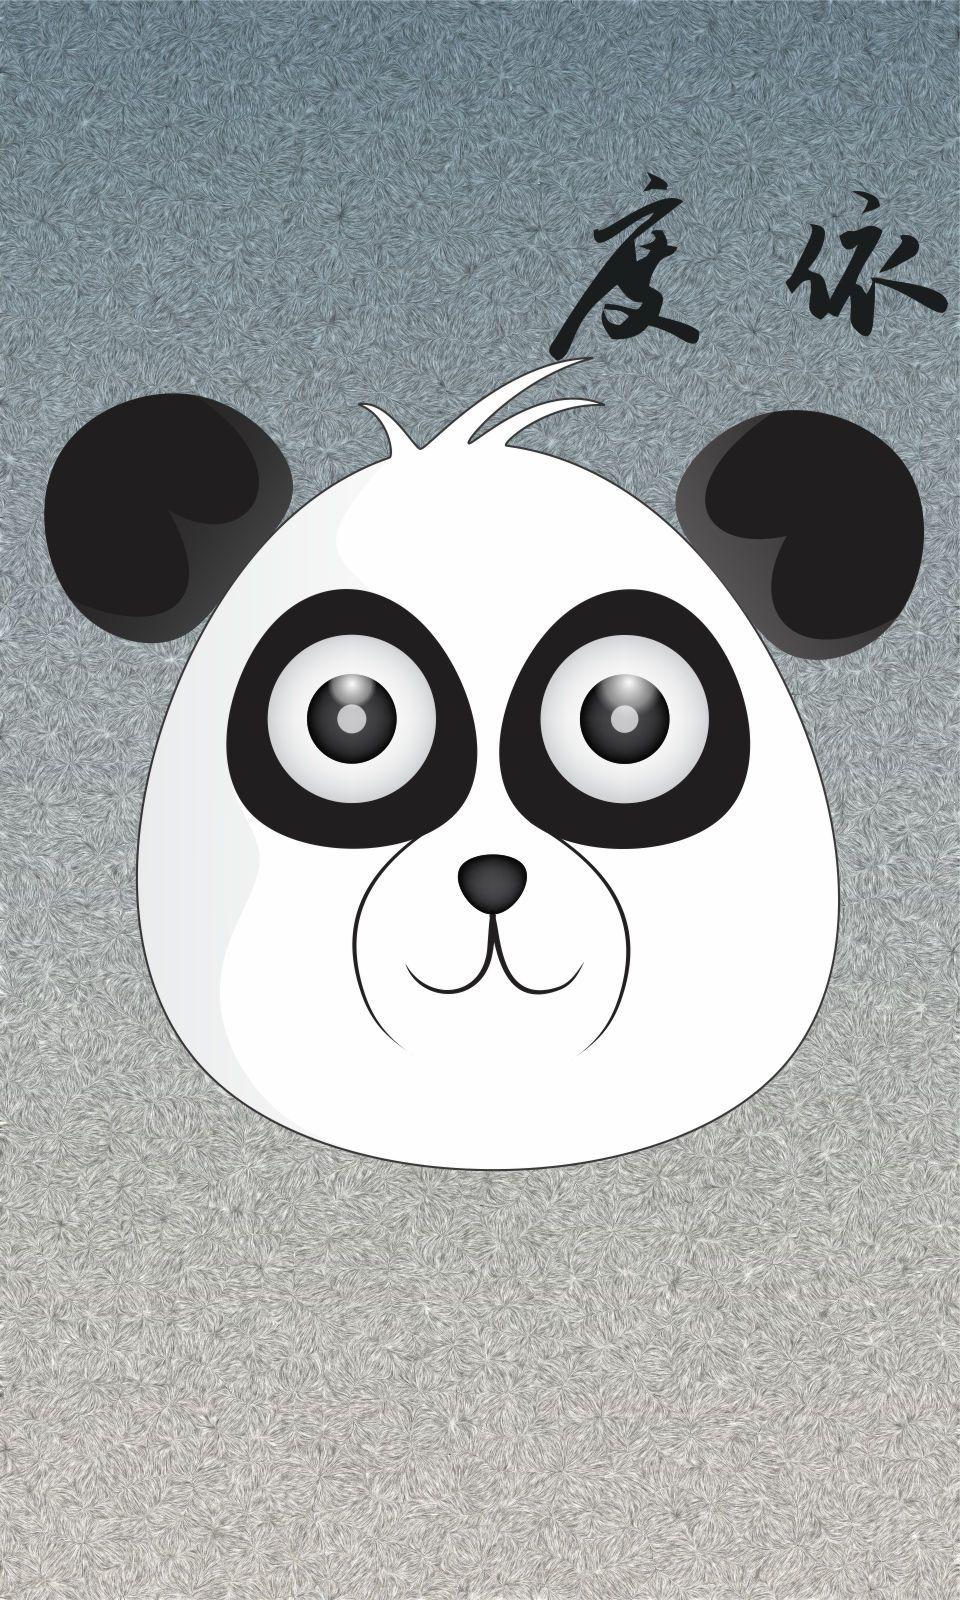 Kumpulan Wallpaper Android Kartun Keren